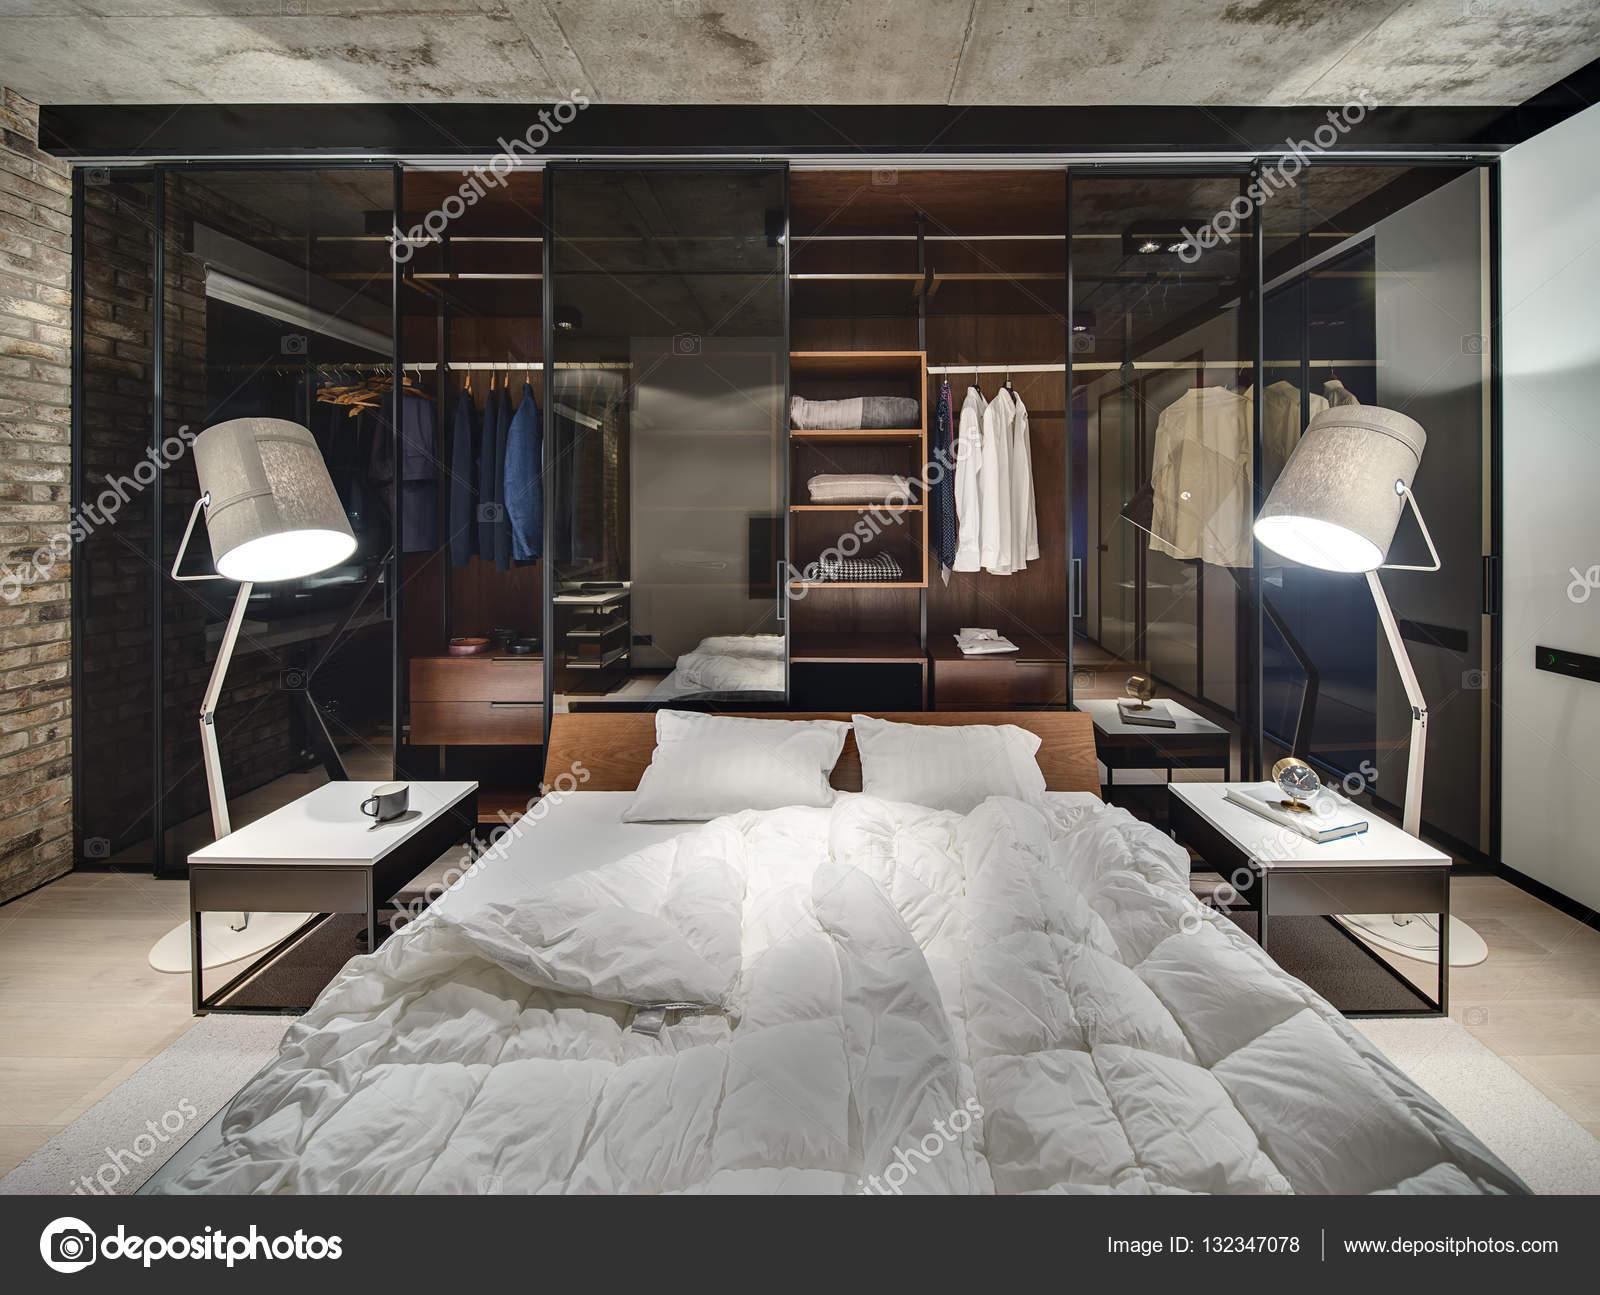 https://st3.depositphotos.com/1371678/13234/i/1600/depositphotos_132347078-stockafbeelding-slaapkamer-in-loft-stijl.jpg